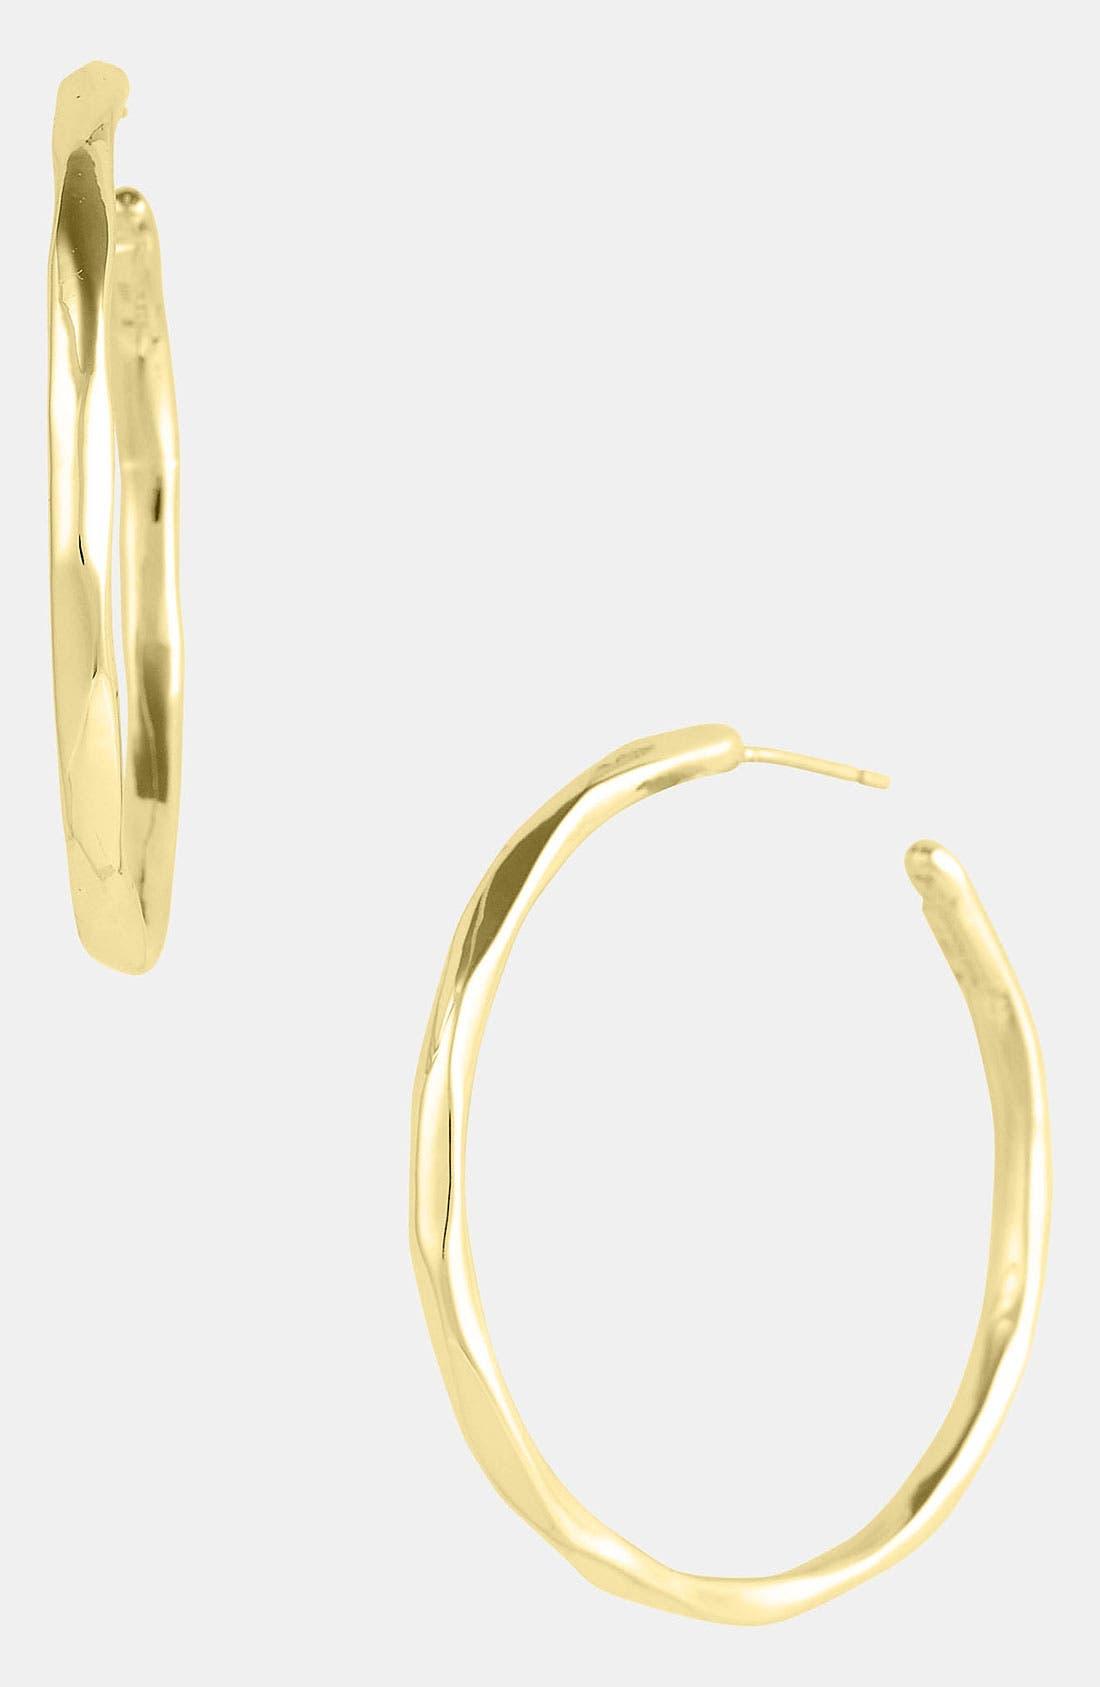 Alternate Image 1 Selected - Ippolita 'Glamazon - Number 3' Faceted 18k Gold Hoop Earrings